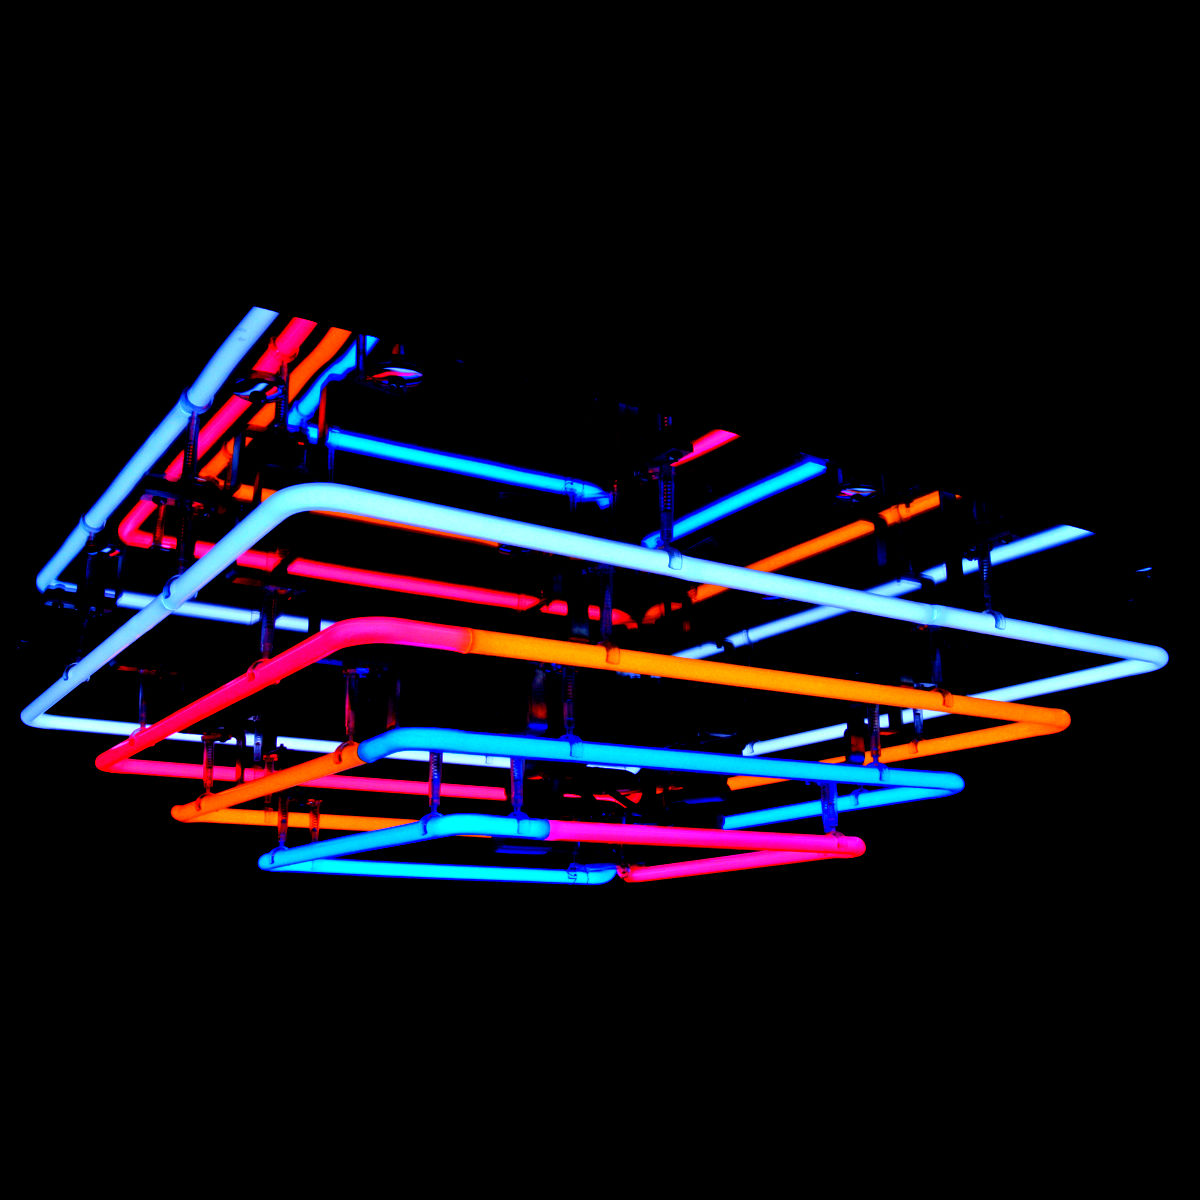 resized square neon chandelier.jpg